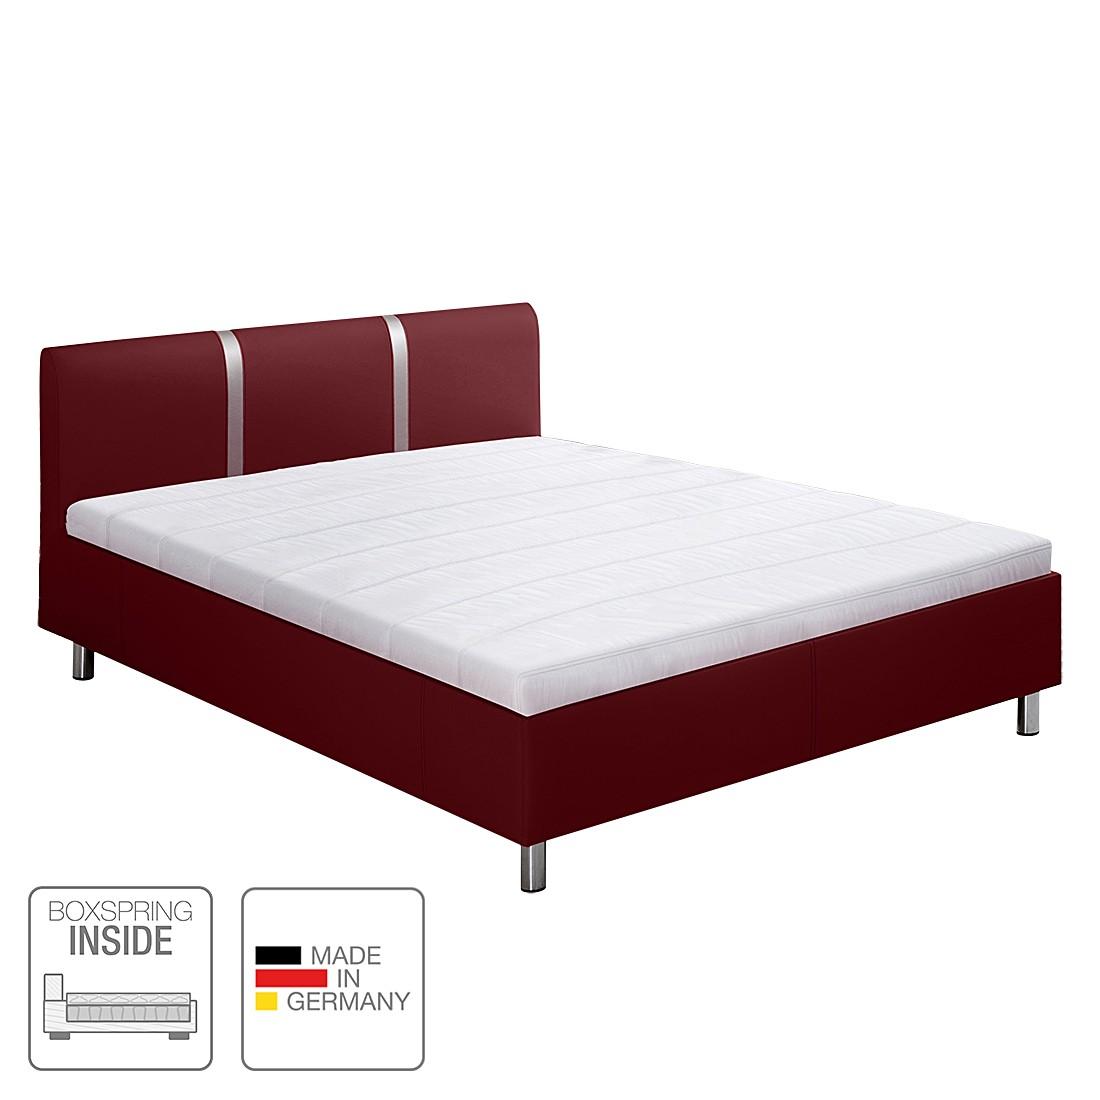 Boxspring-Inside-Bett Caya - Kunstleder - 180 x 200cm - H4 ab 100 kg - Tonnentaschenfederkernmatratze - starrer Lattenrost mit 19 Federholzleisten - Rot, Nova Dream Sleepline